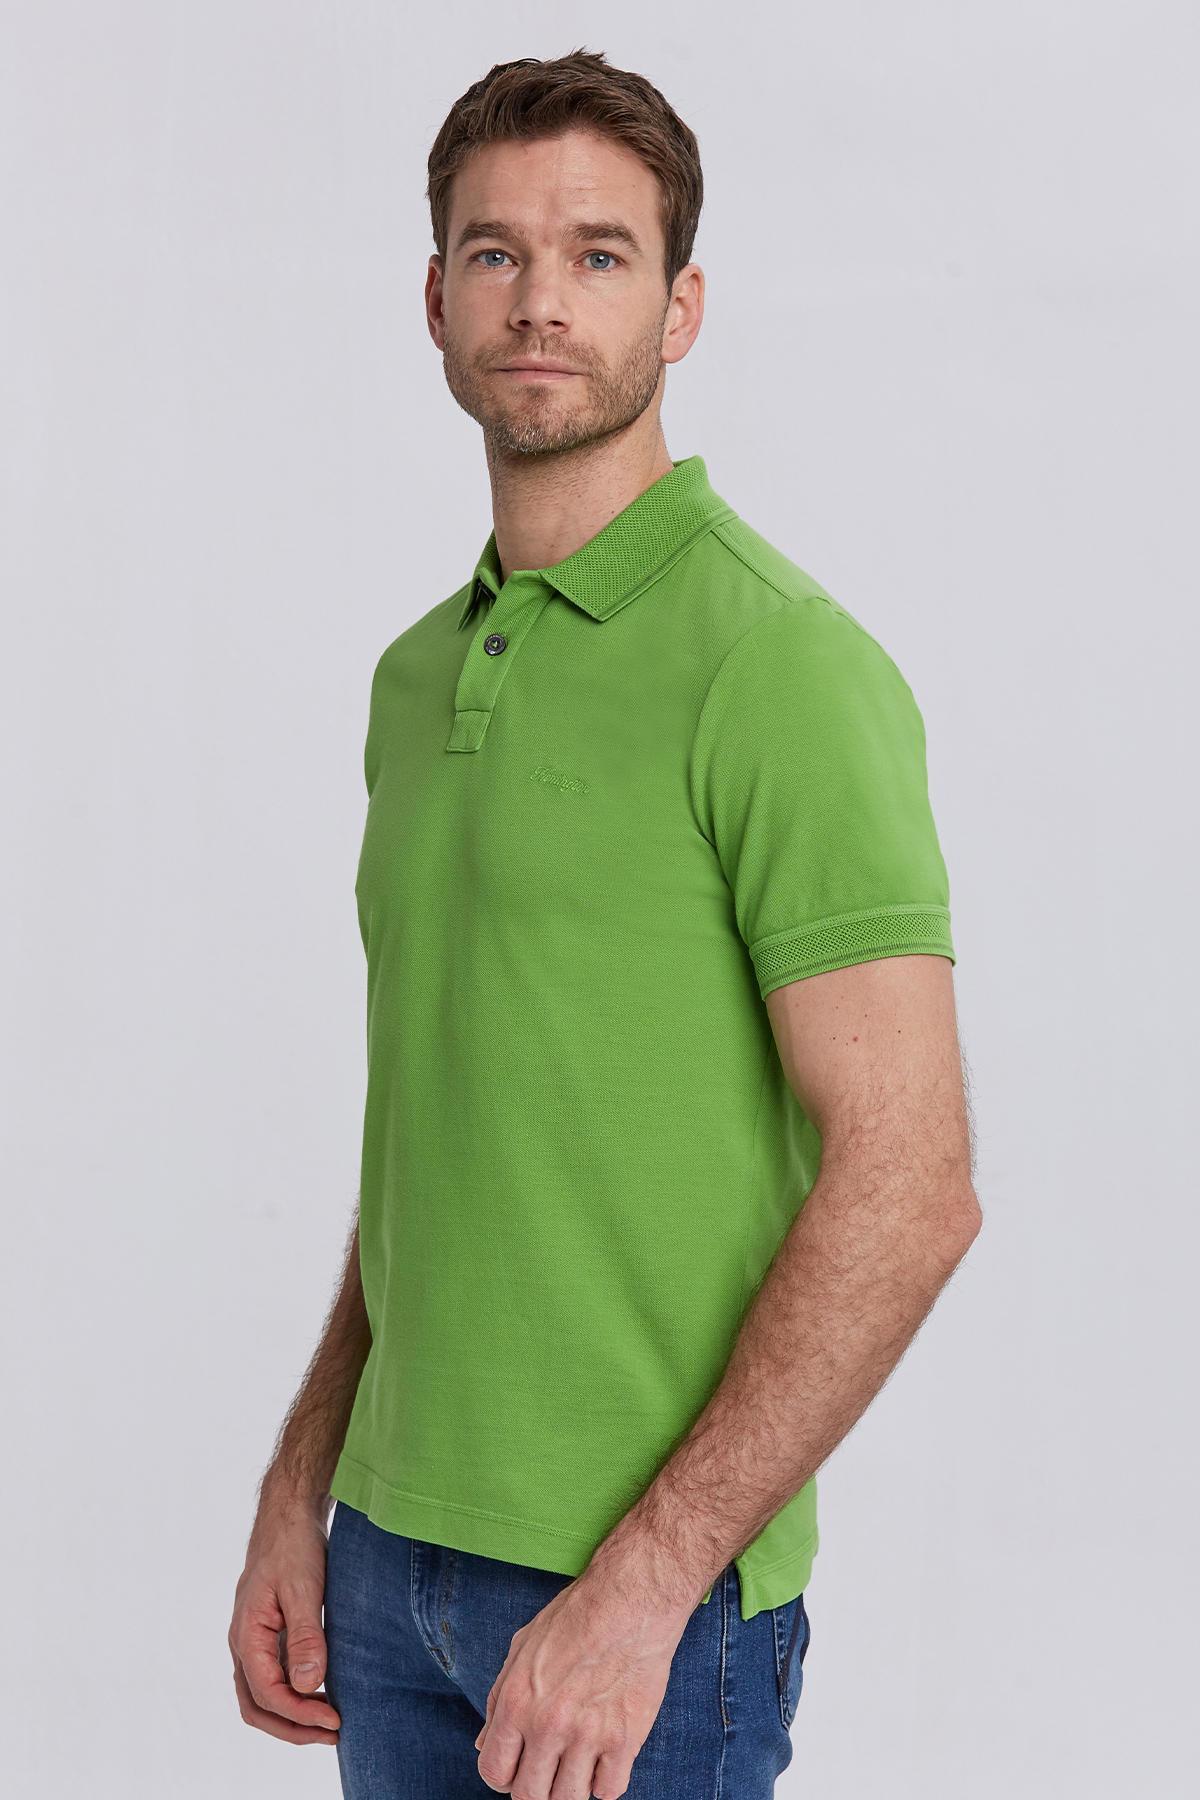 Vintage Görünümlü Yeşil Polo Yaka T-Shirt